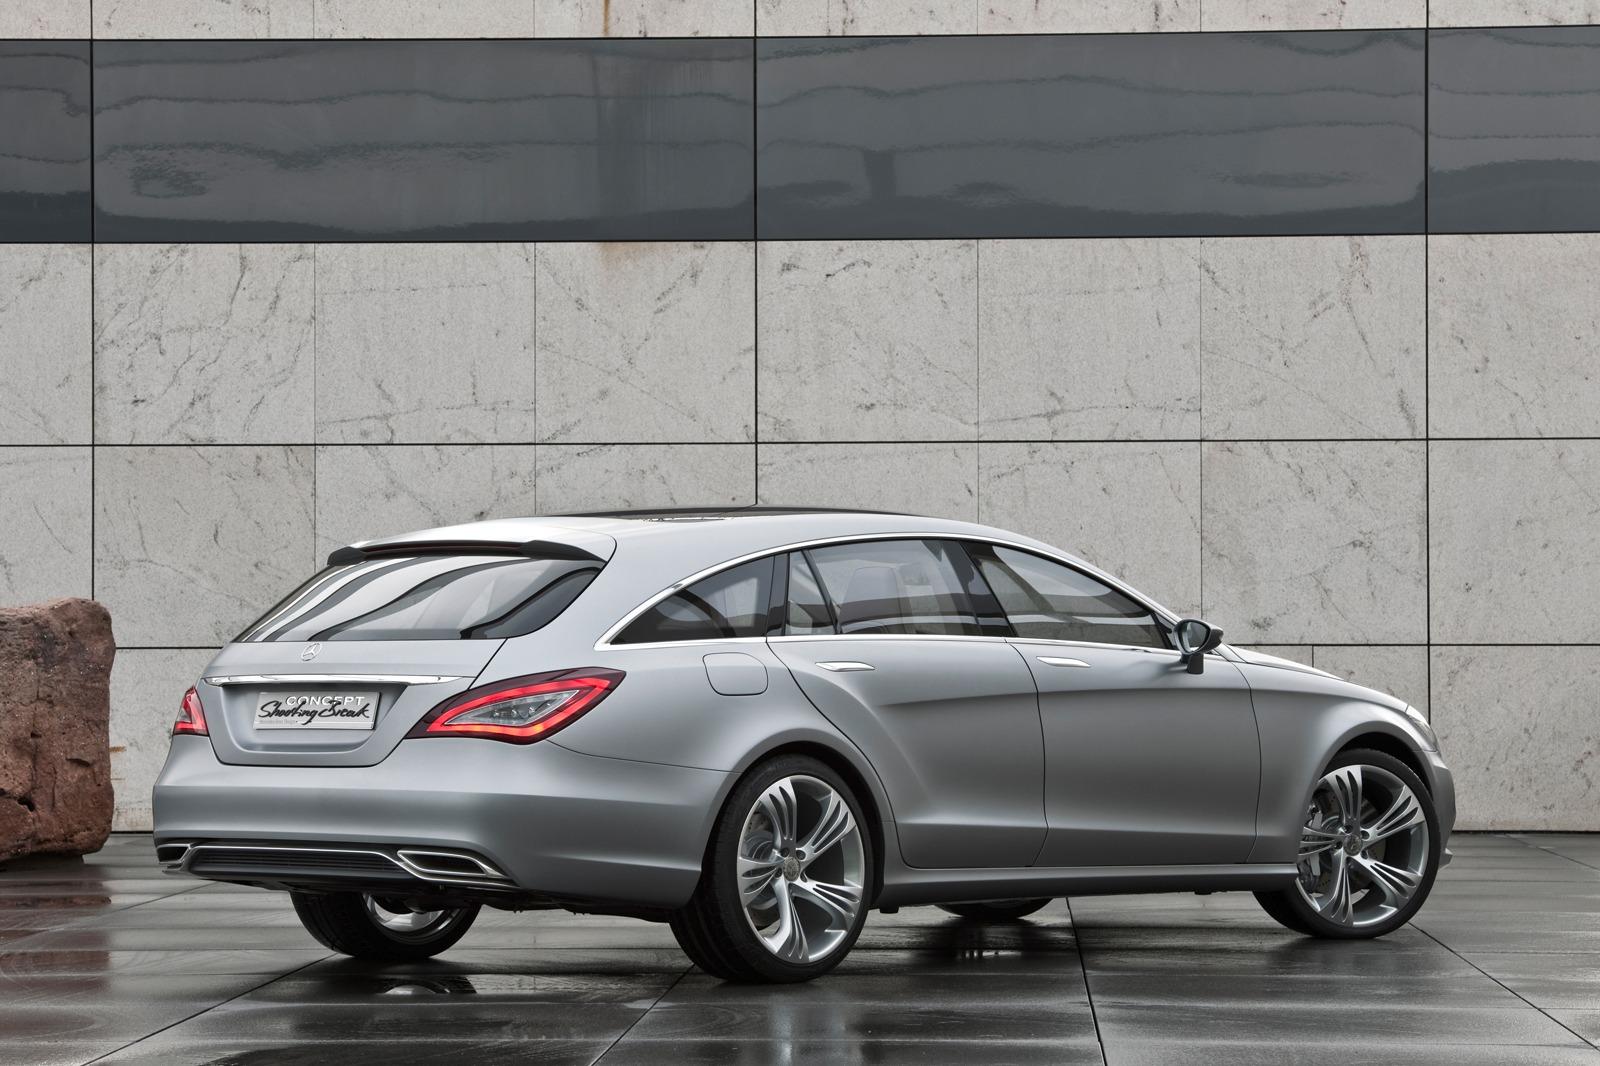 Mercedes cls shooting break concept auto titre for Mercedes benz cls station wagon